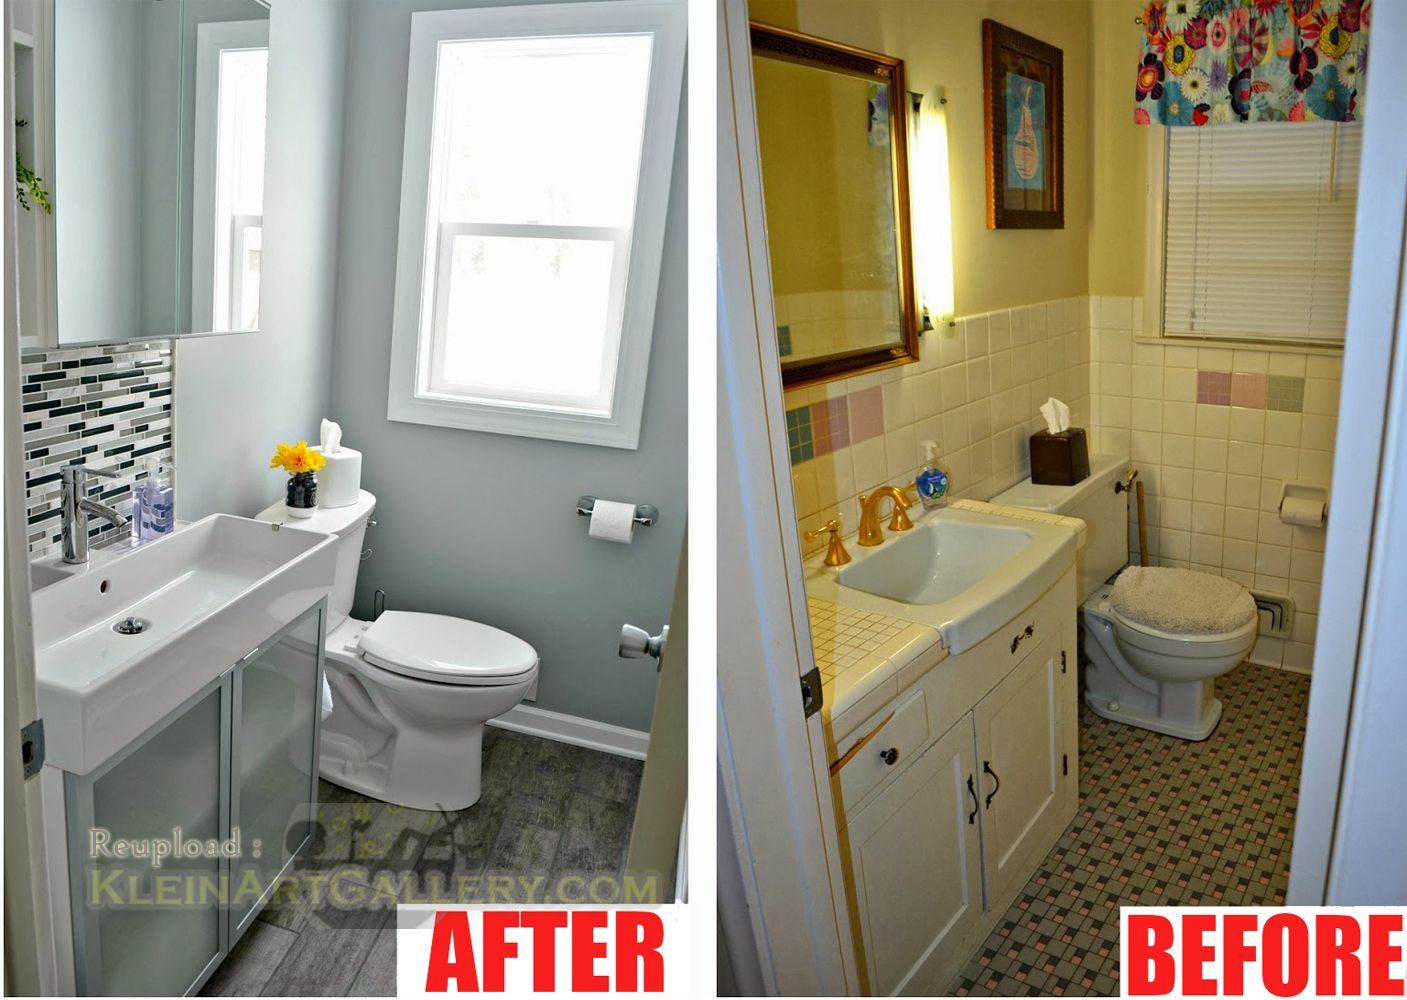 Stylish Remodel Bathroom Small Es Bathroom Design Ideas Remodels Pleasing Bathroom Remodeled Decorating Inspiration